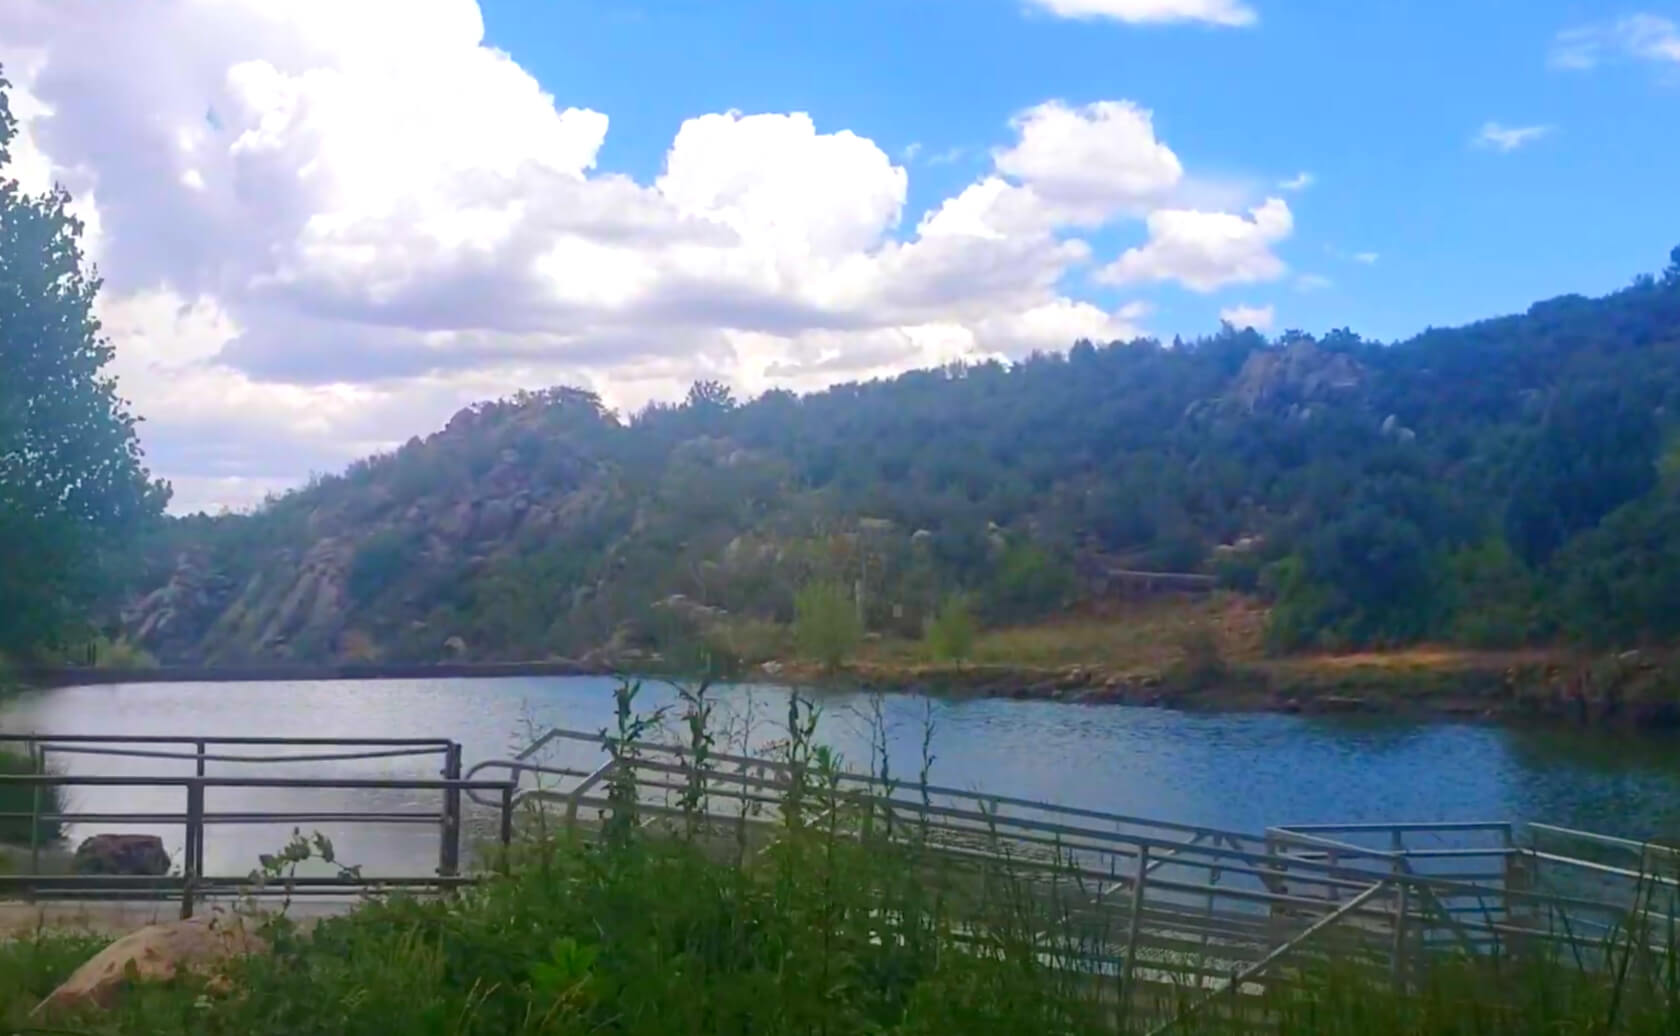 Fain-Lake-fishing-guide-report-prescott-valley-az-01